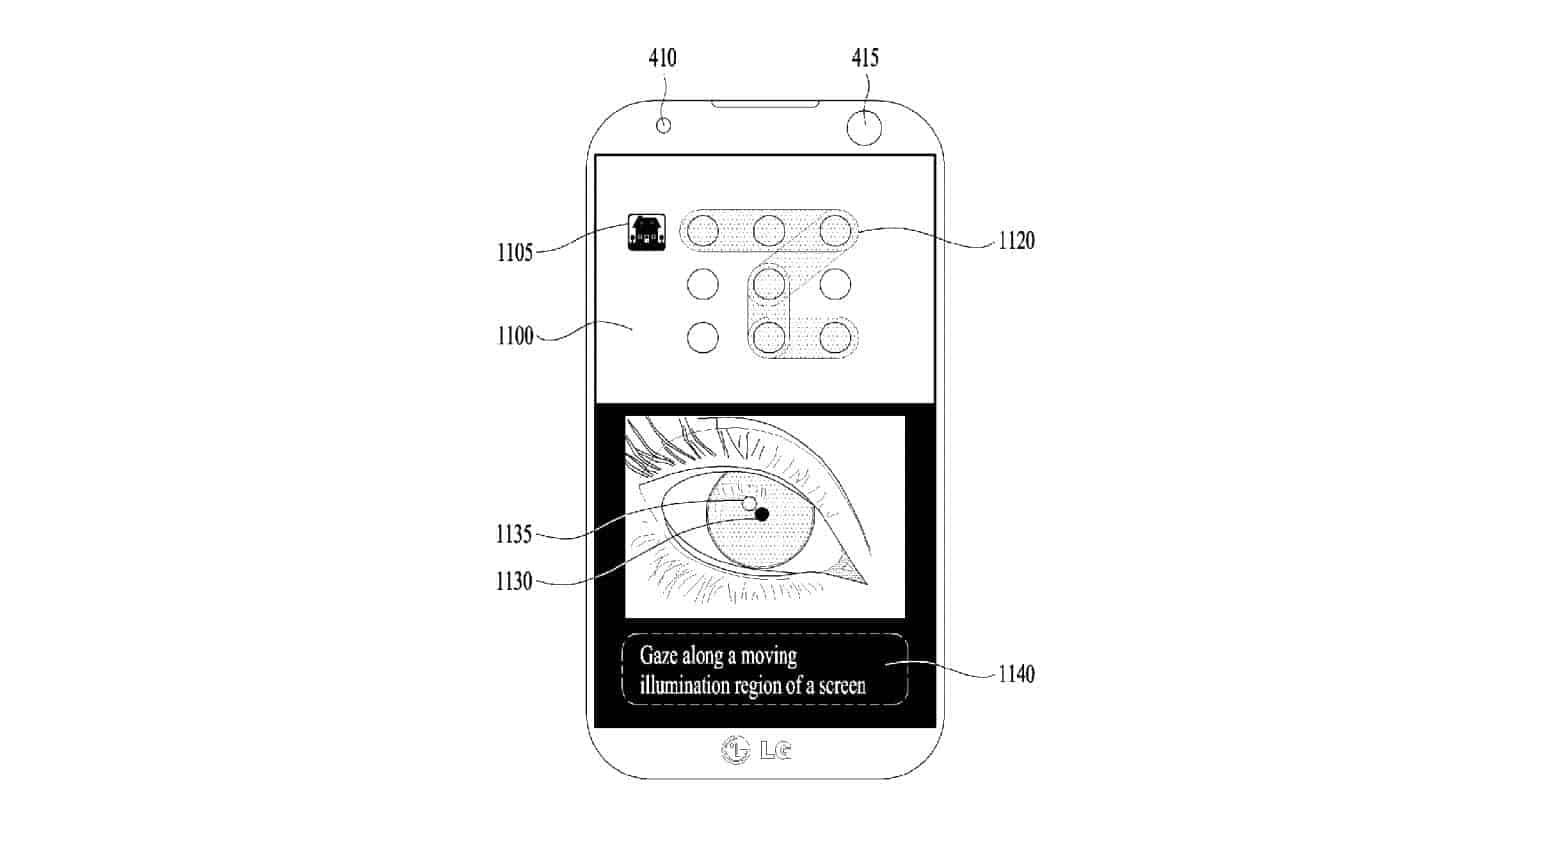 LG Iris WIPO Patent 10